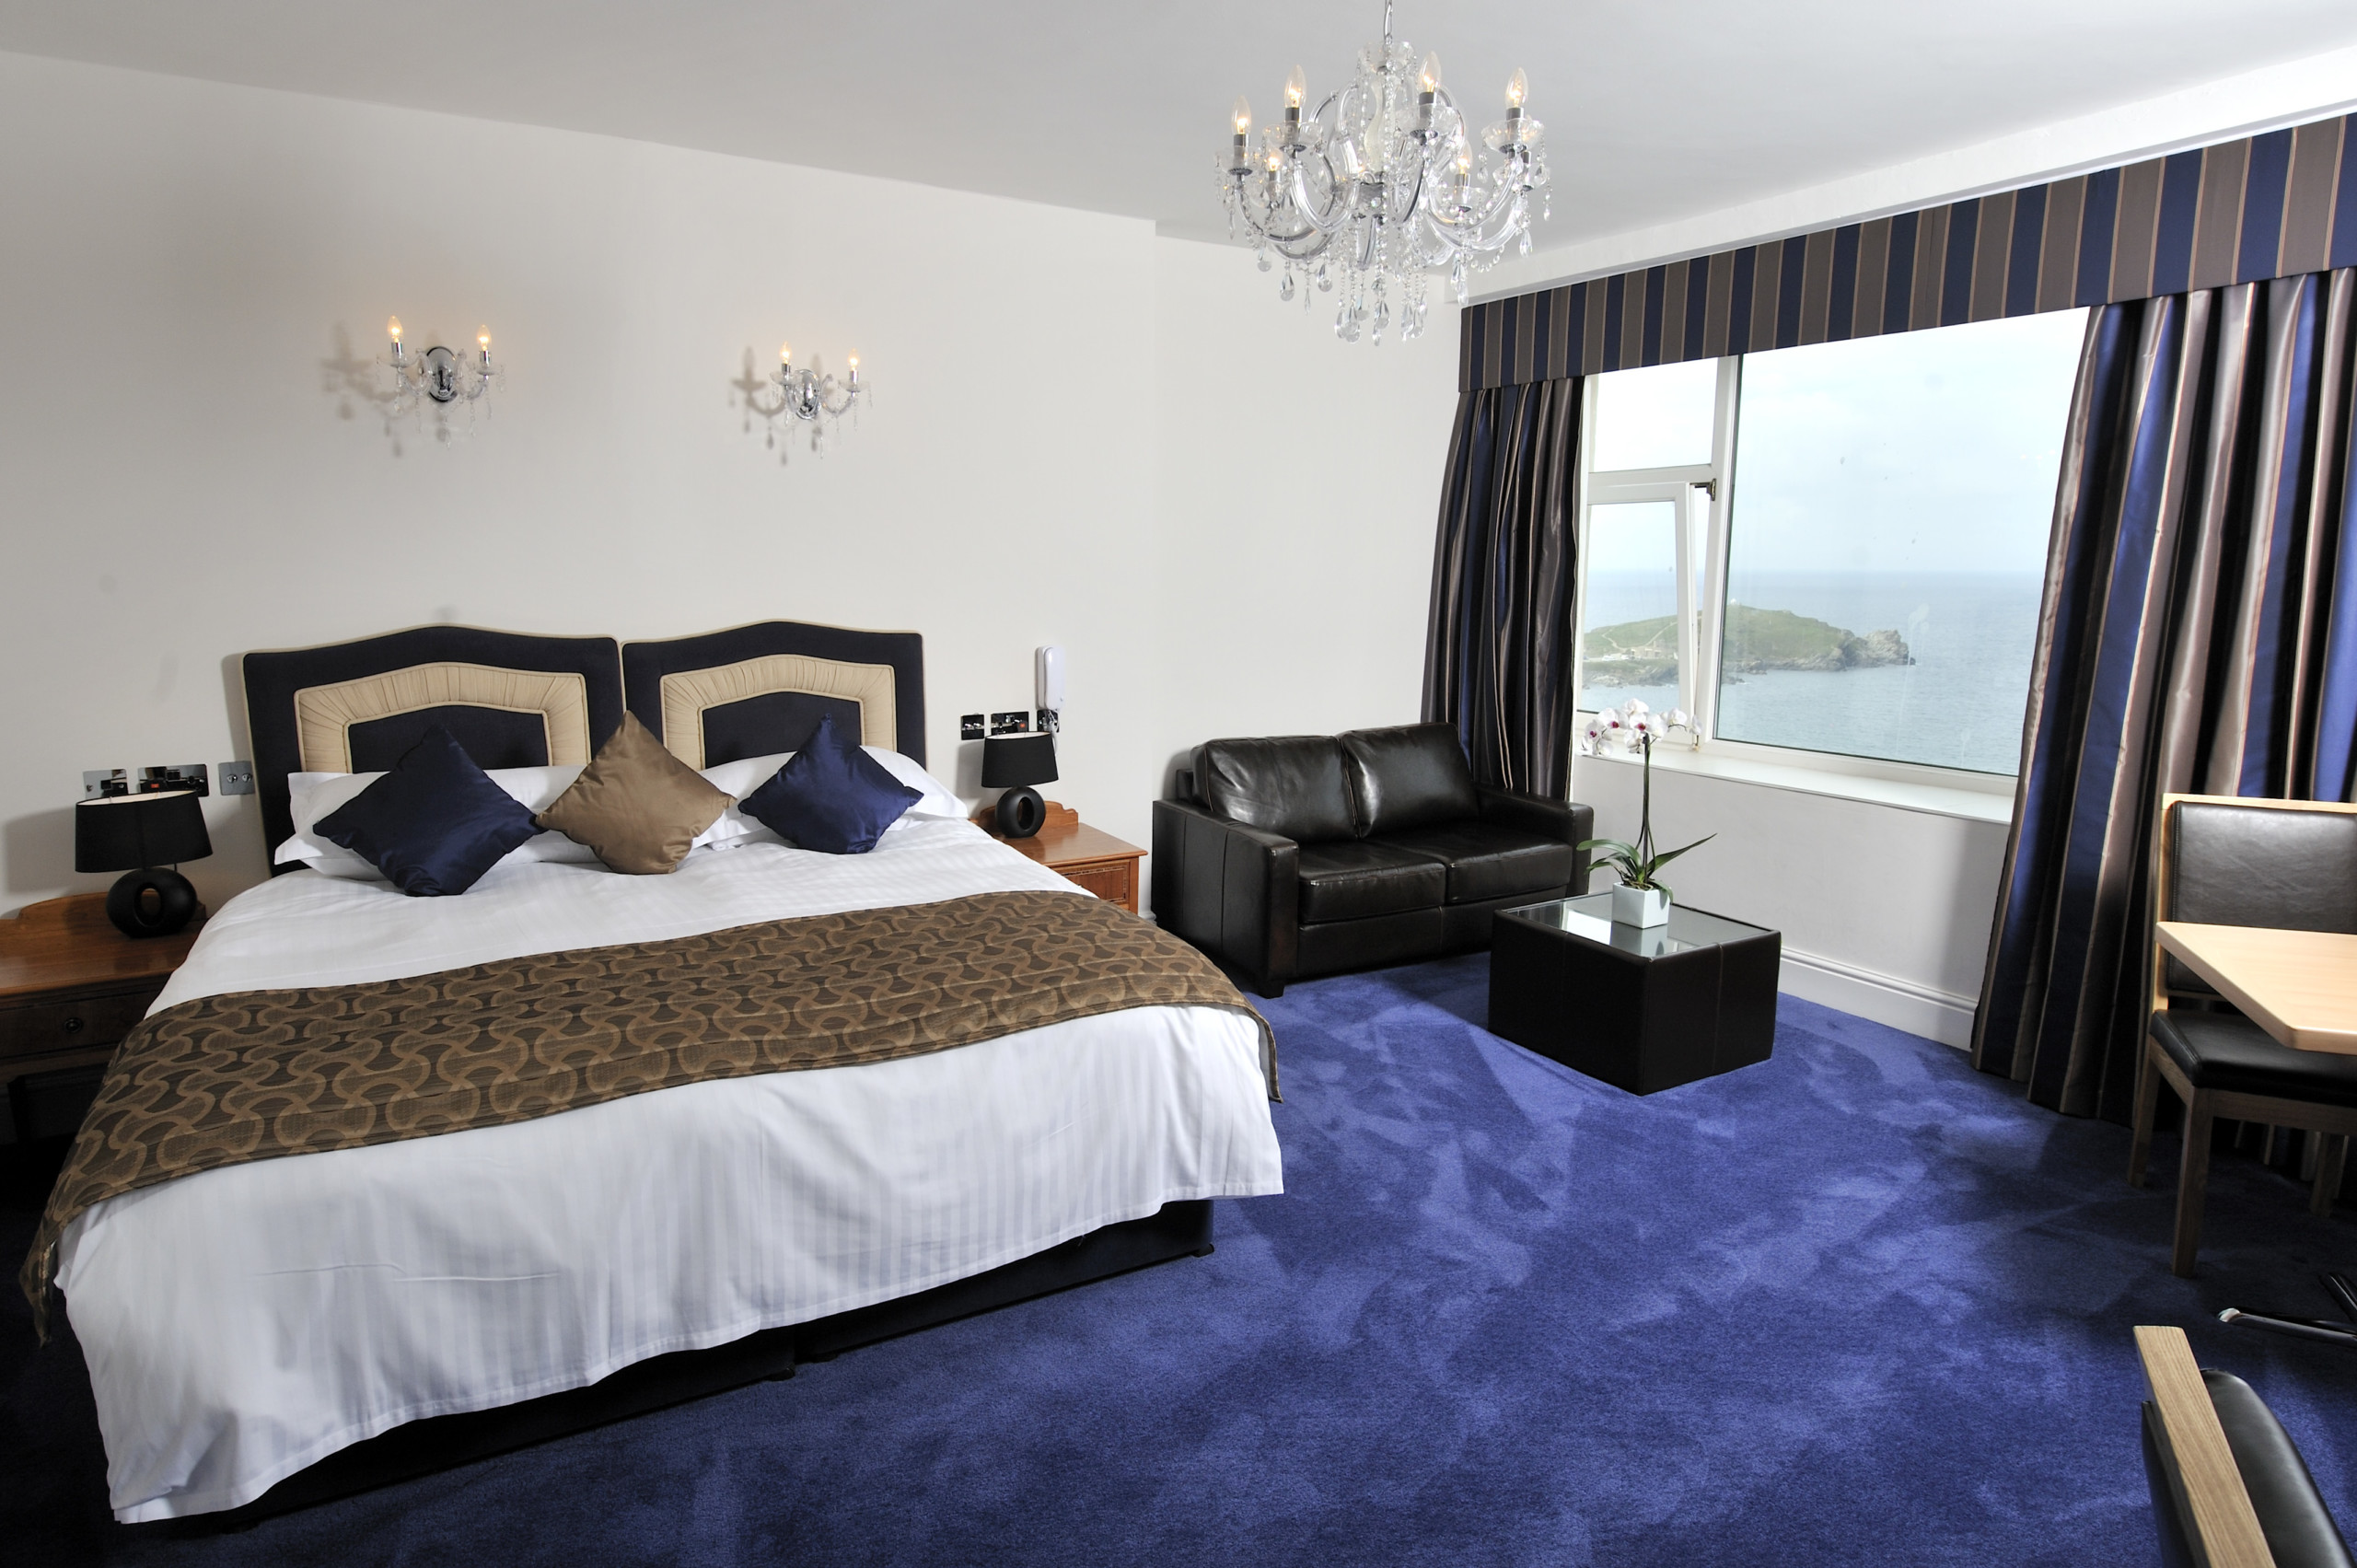 Atlantic Hotel Newquay - Bedroom 1